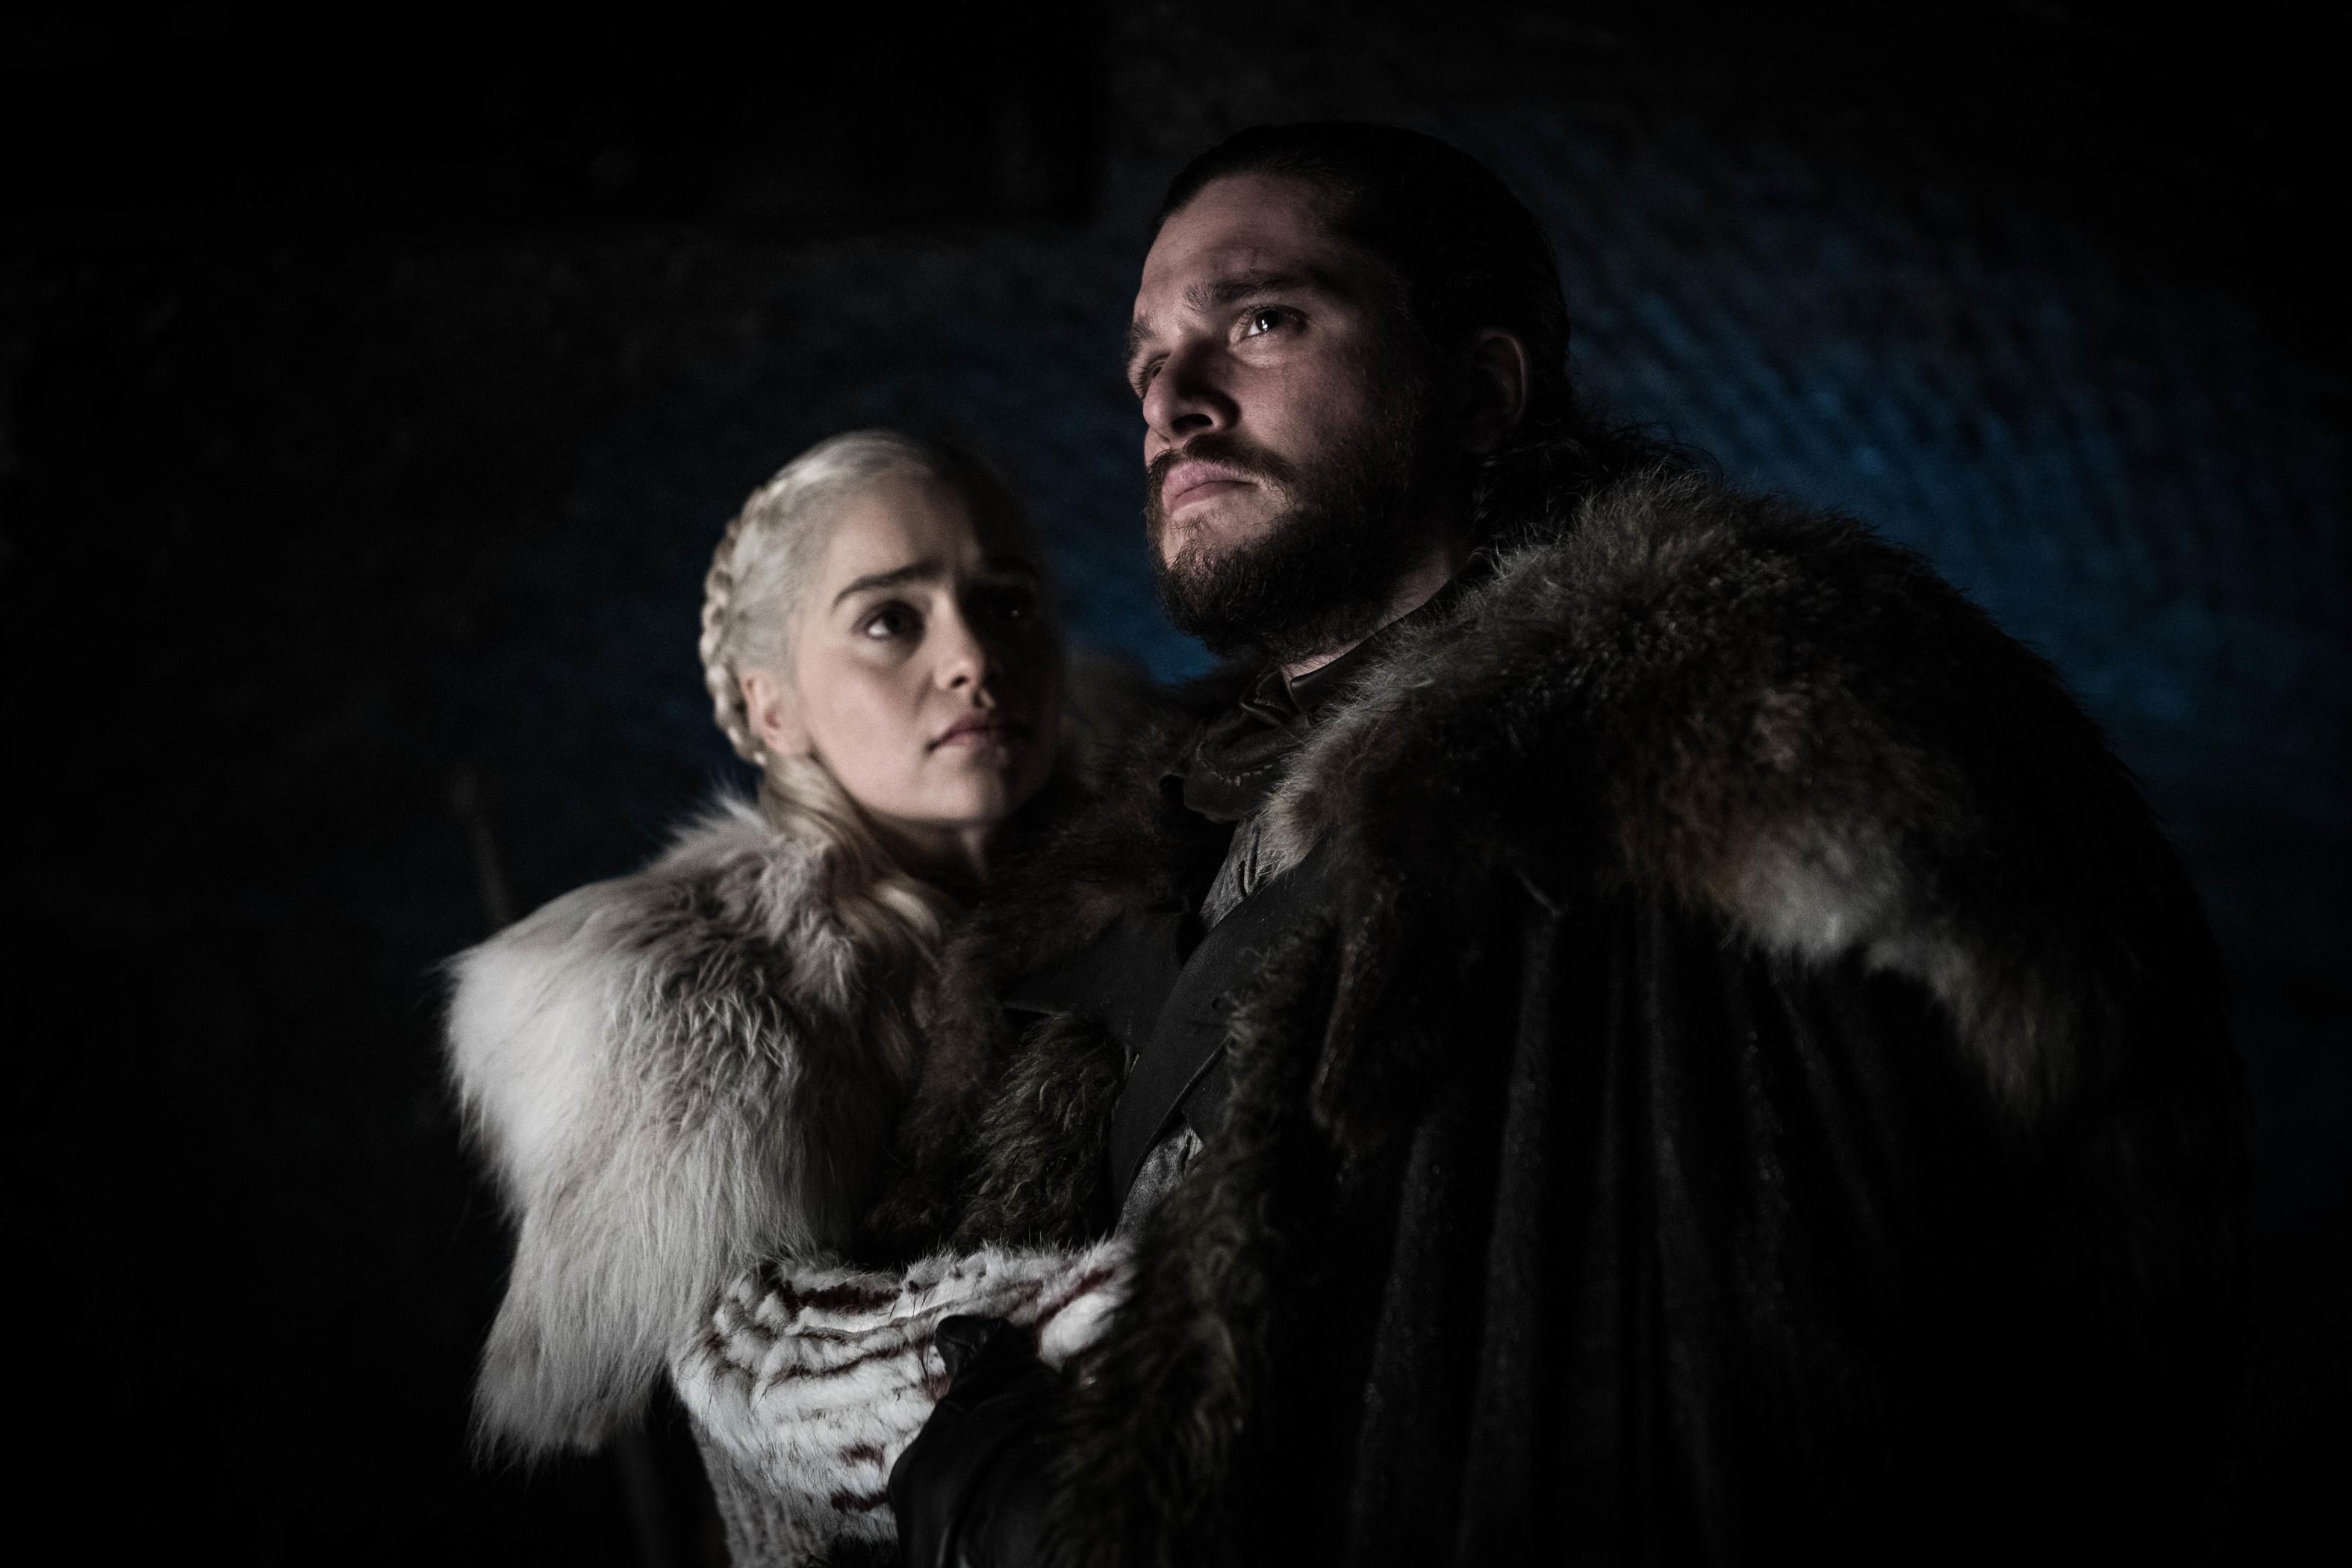 Última temporada de 'A Guerra dos Tronos'. O que sabemos até agora?